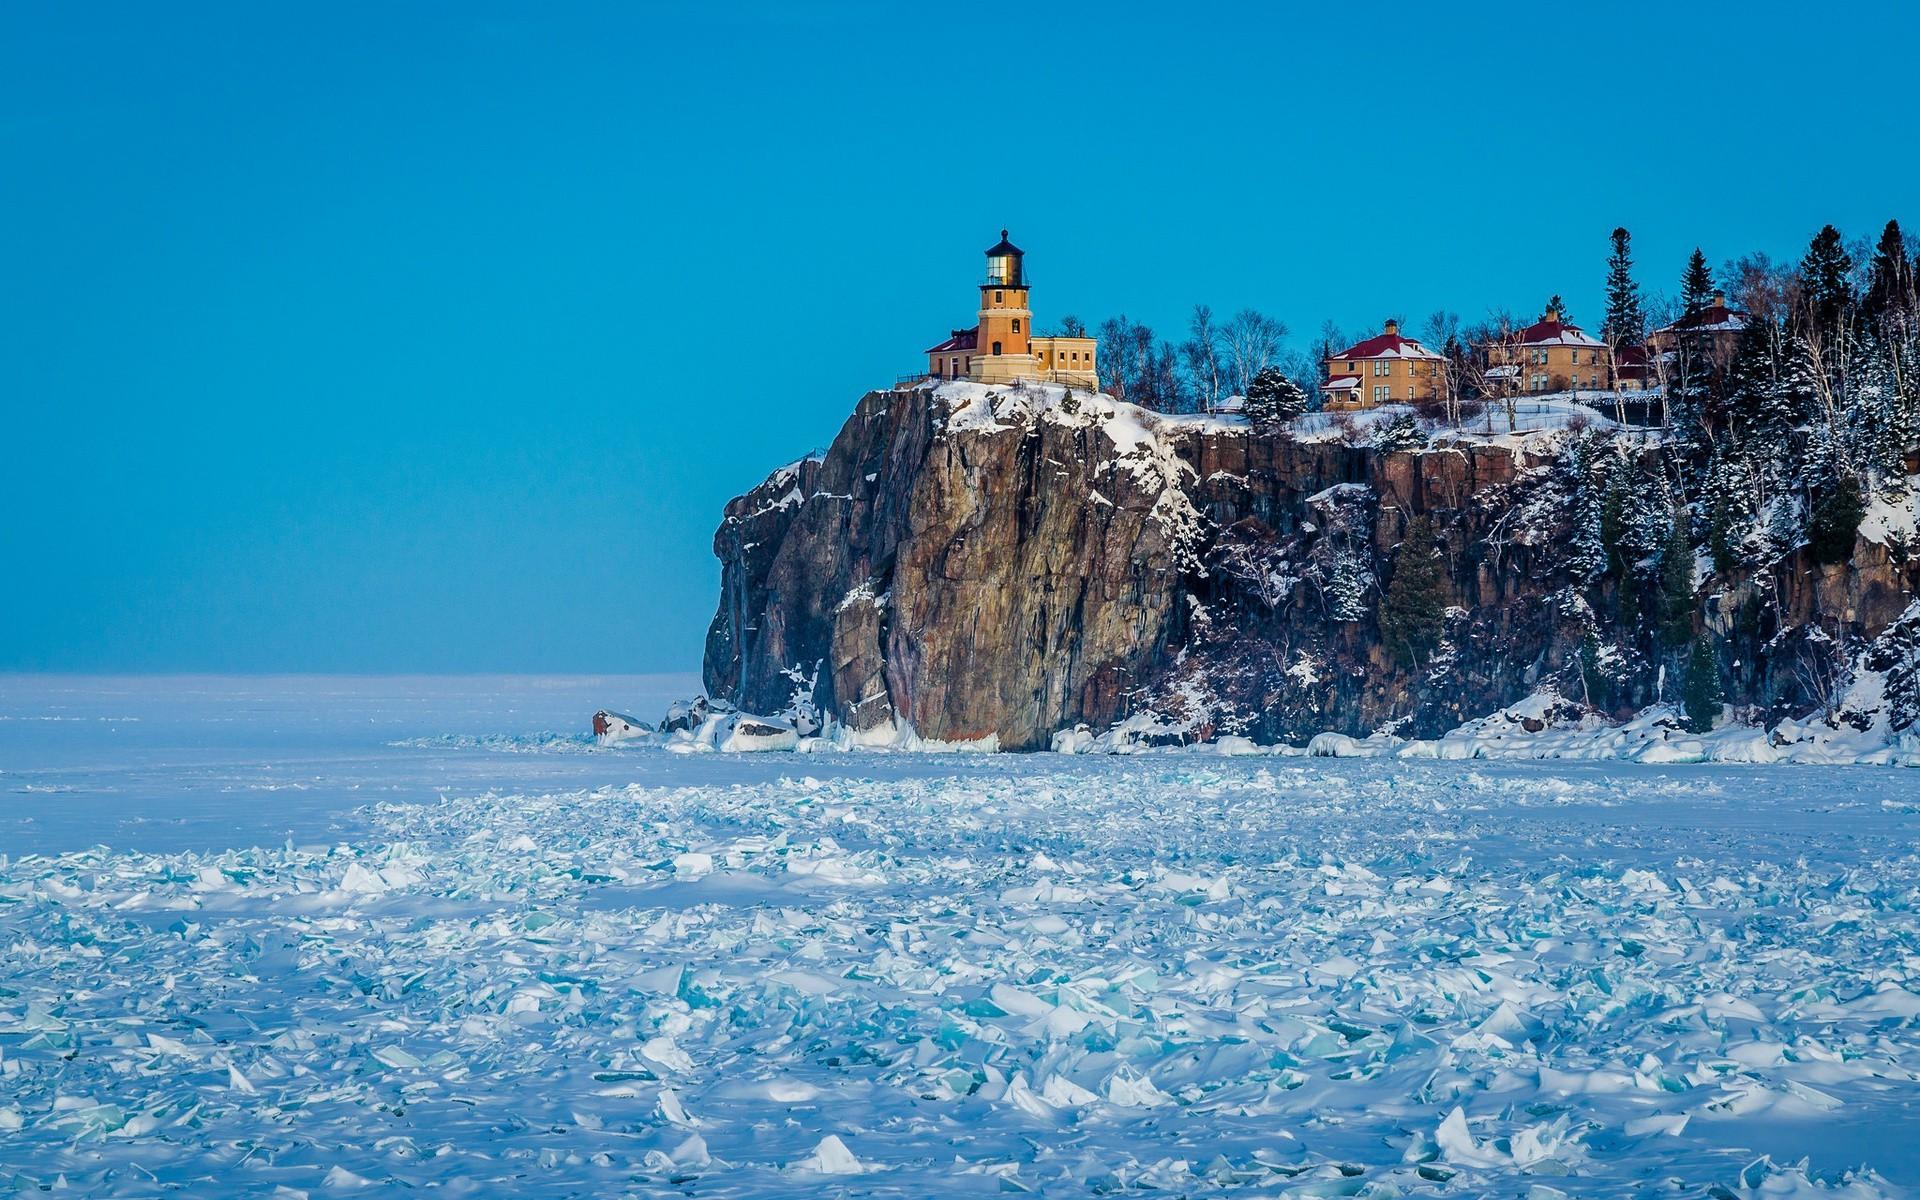 Great Lakes Lighthouse Wallpaper Screensaver